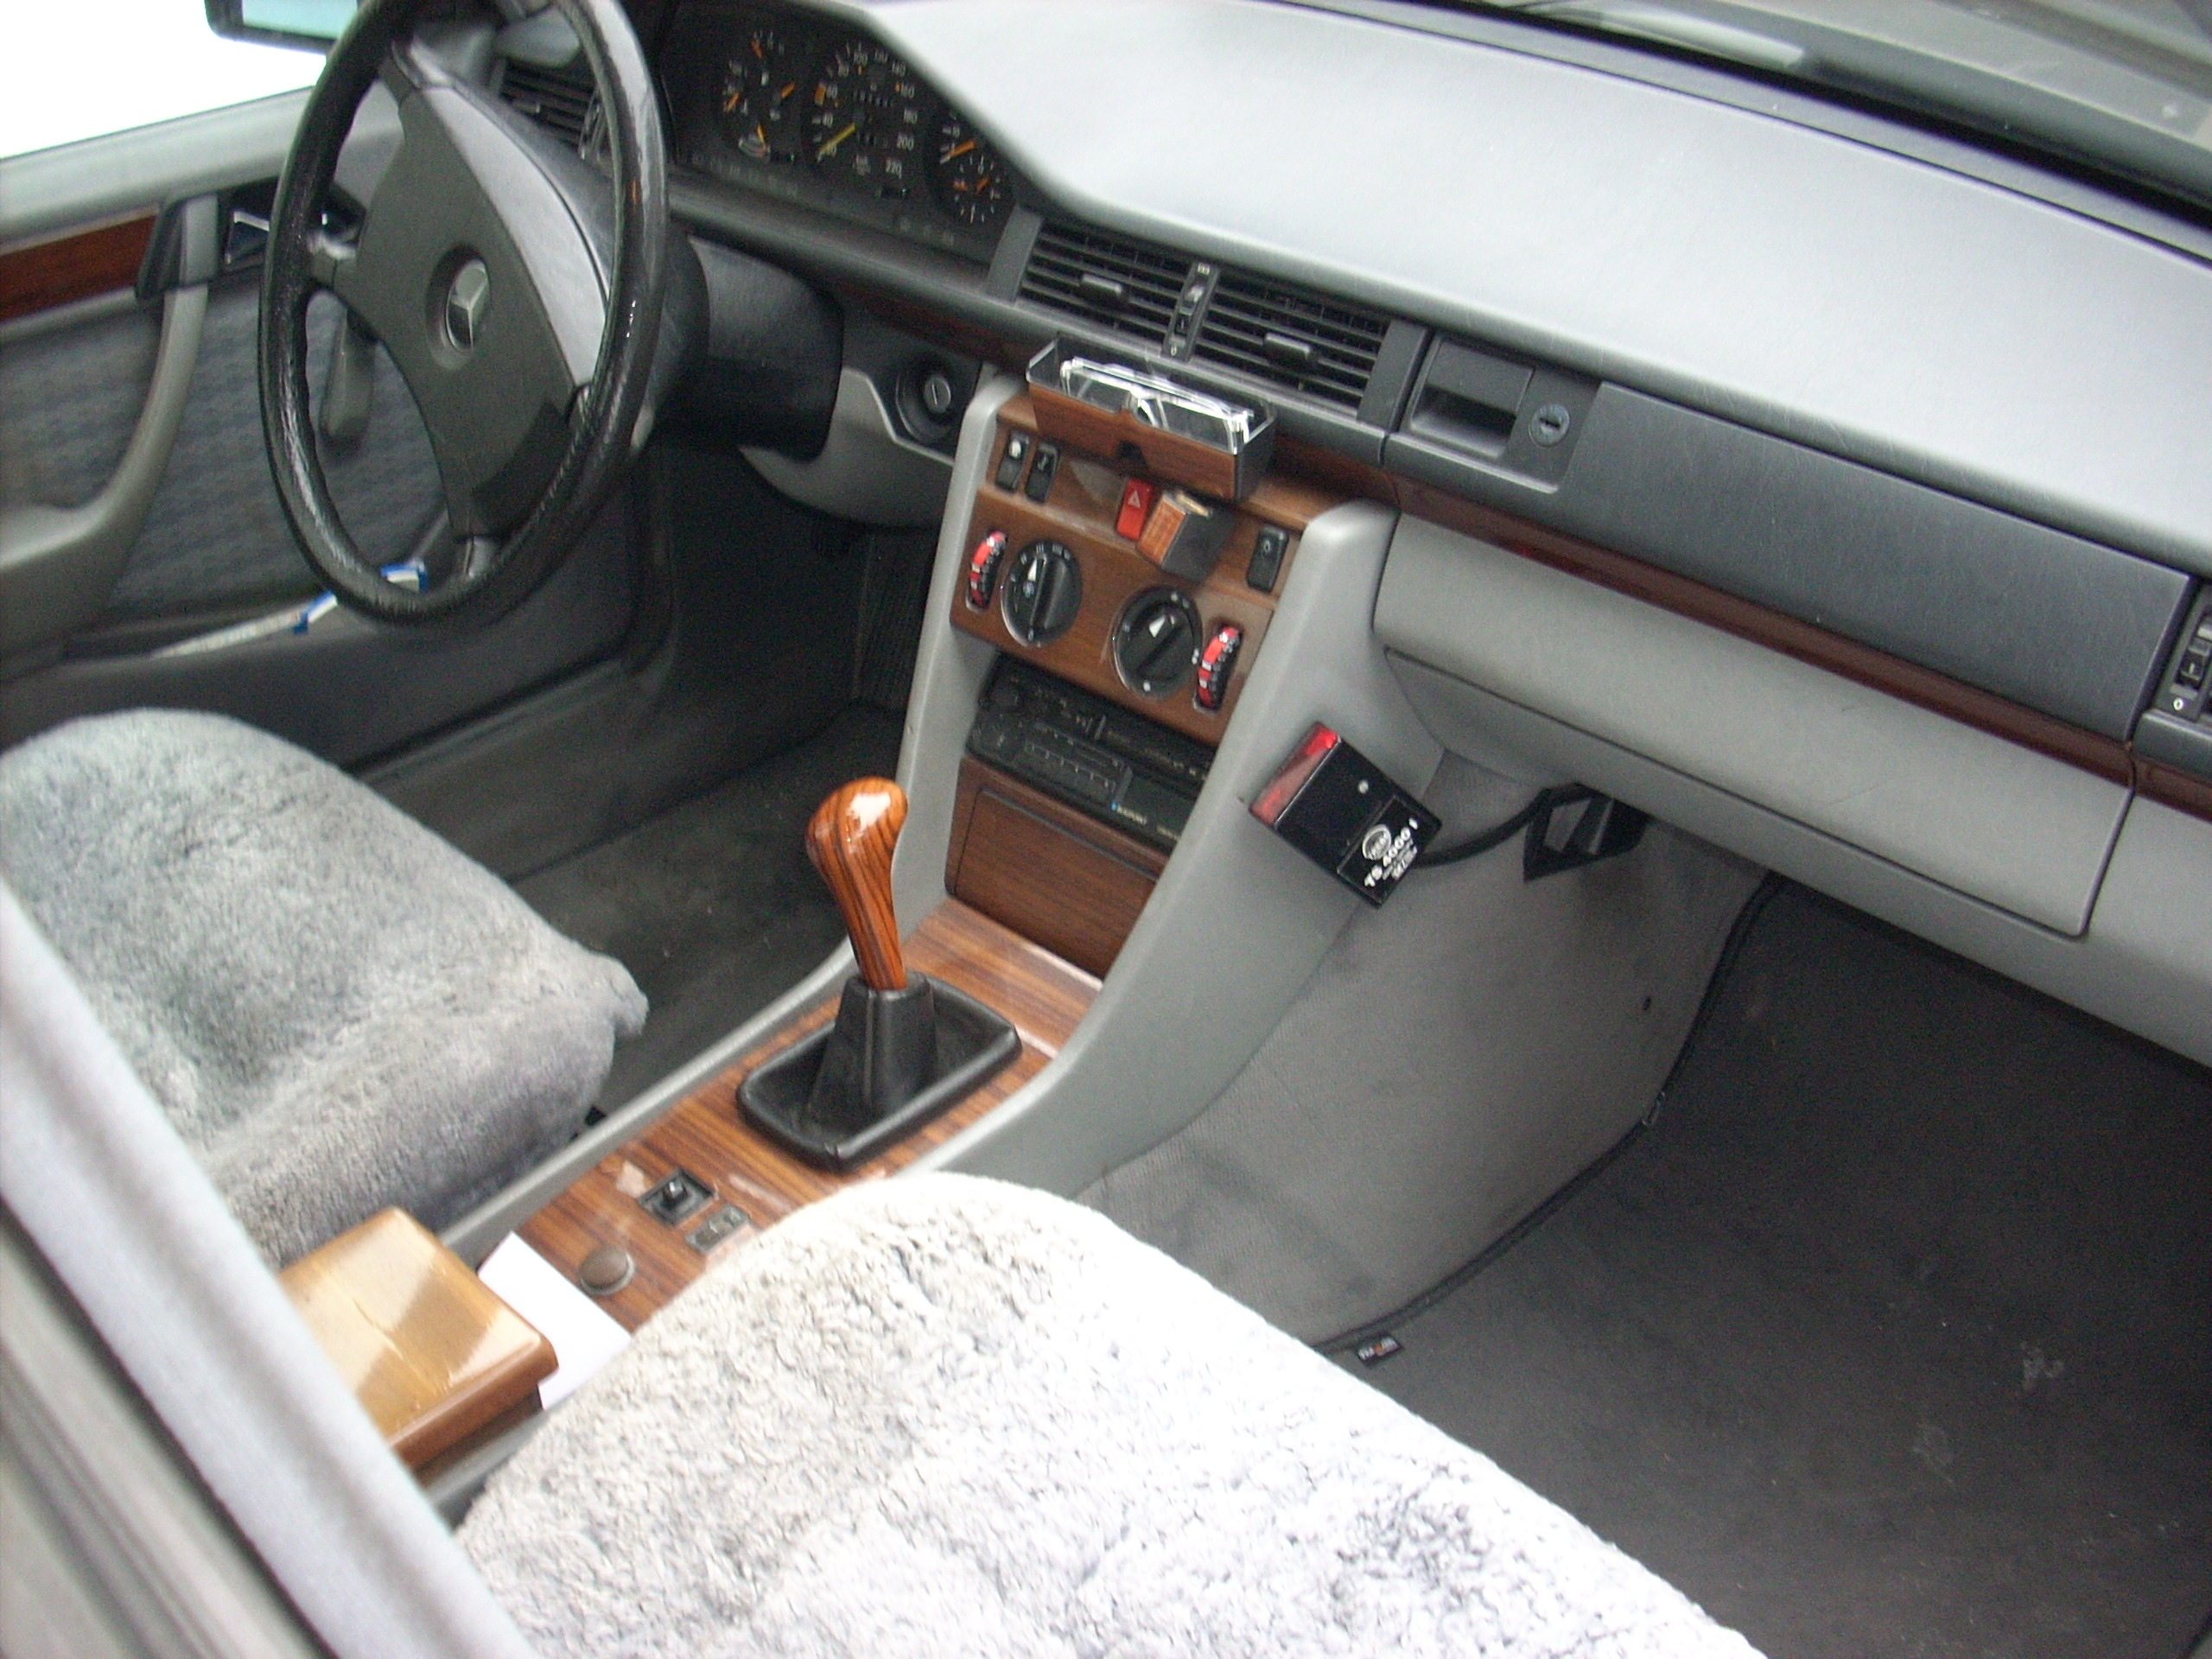 Mercedes benz 230 technische daten und verbrauch for Mercedes benz of wilmington de